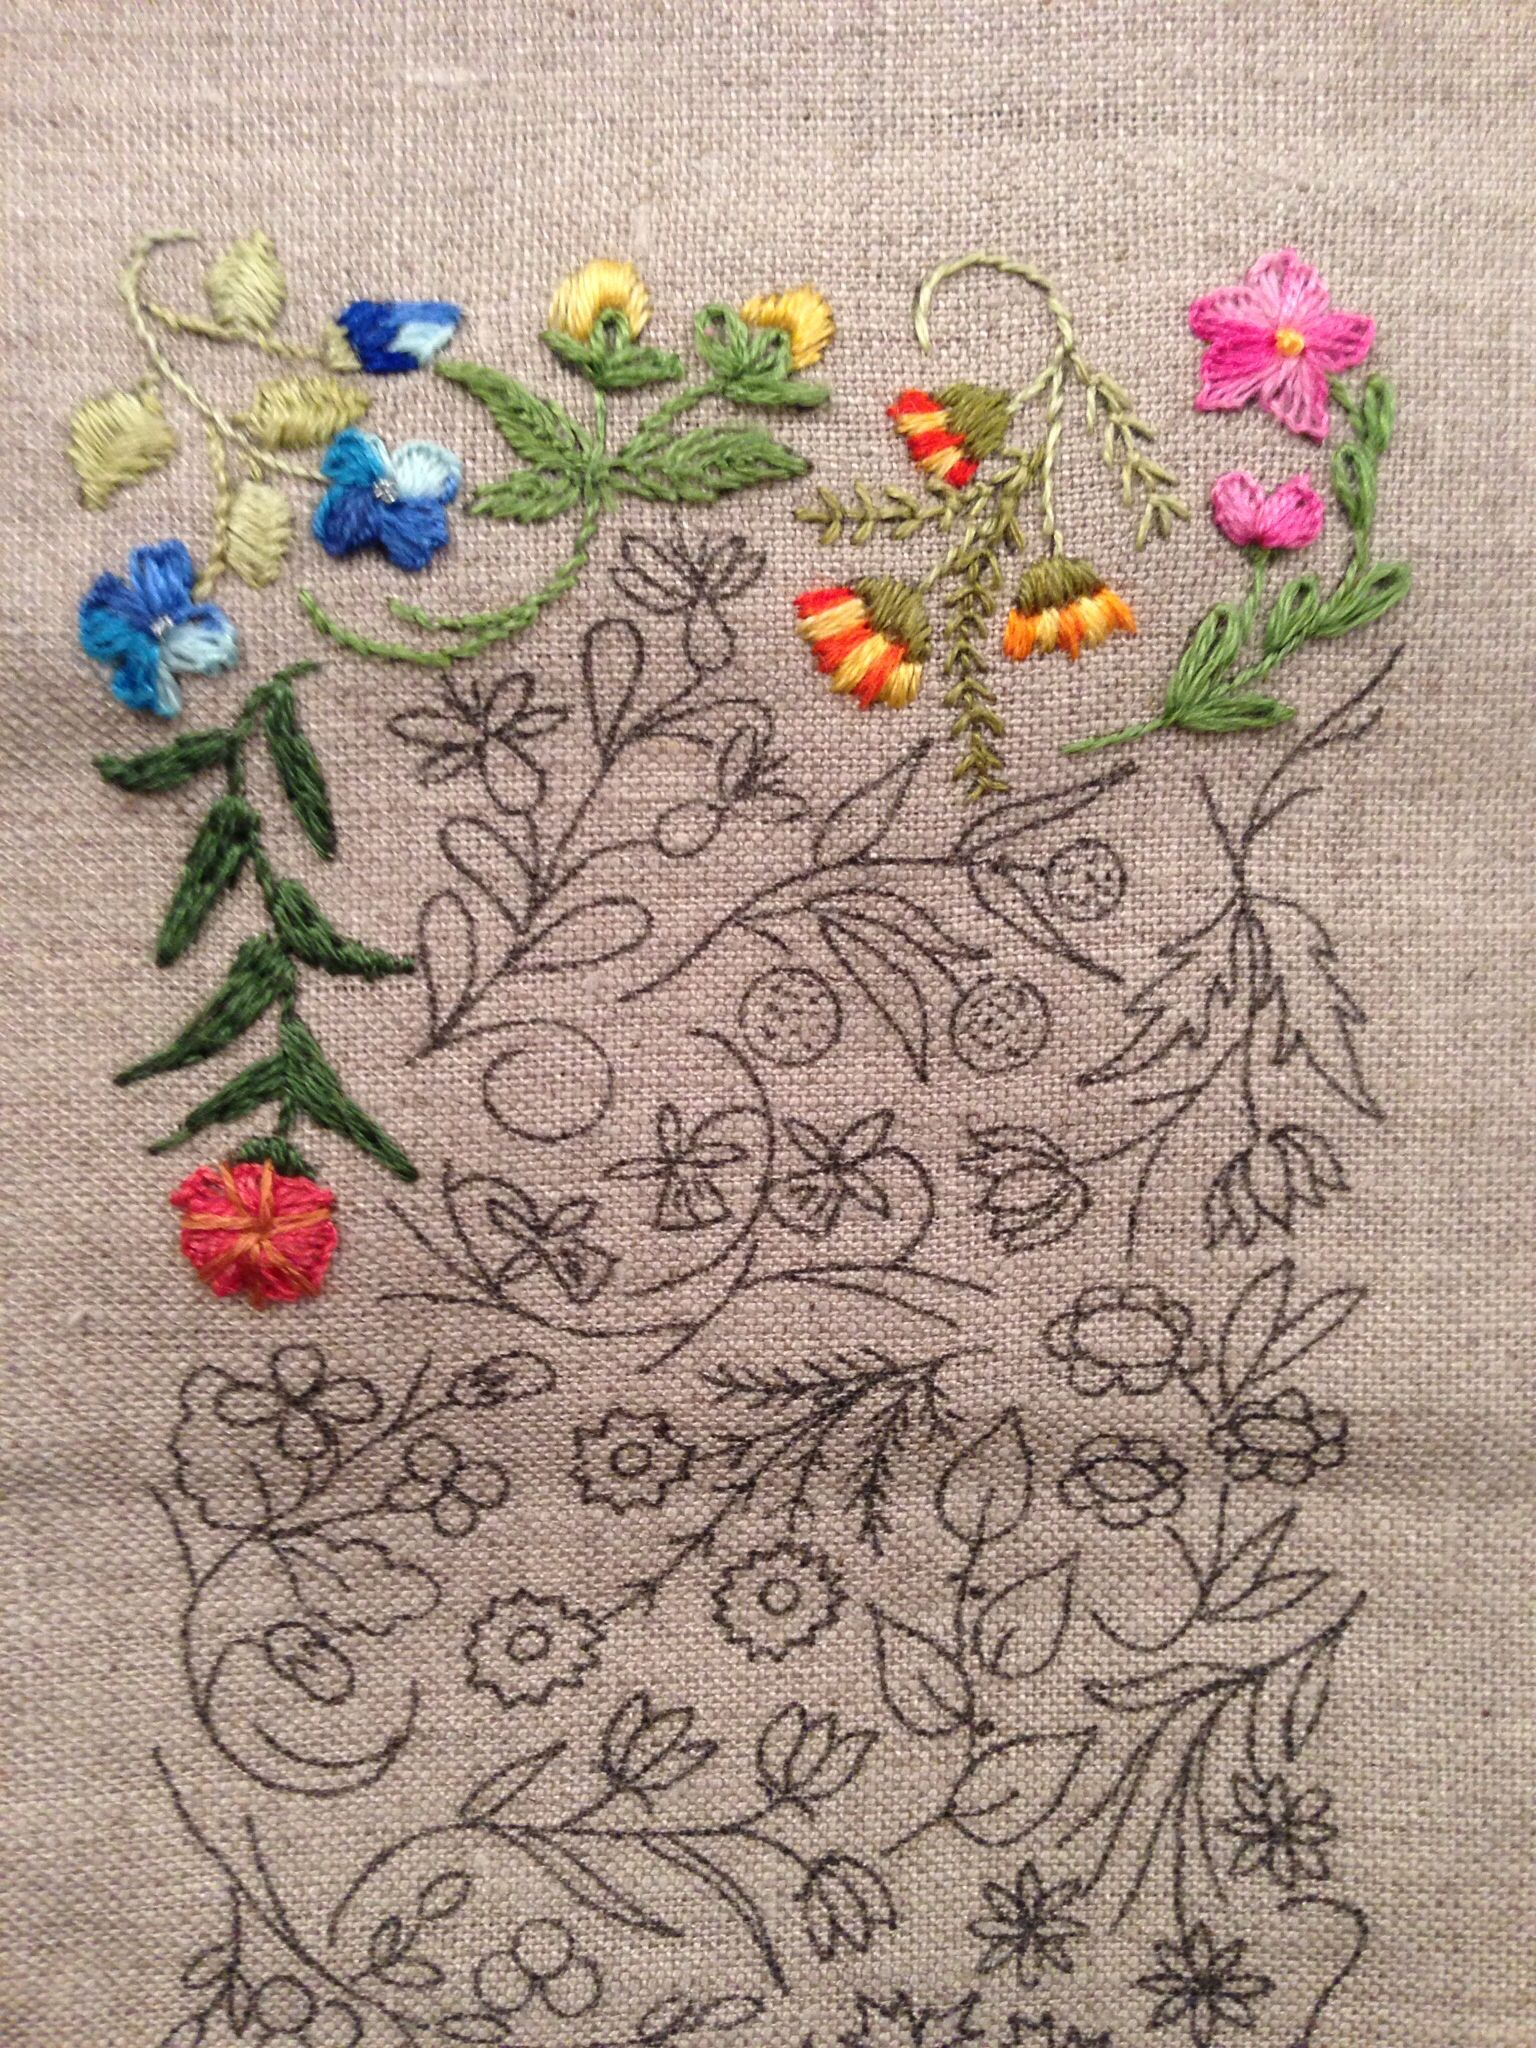 Mille Fleurs - Progress 5 blanket stitch, straight stitch, stem stitch and long and short stitch.